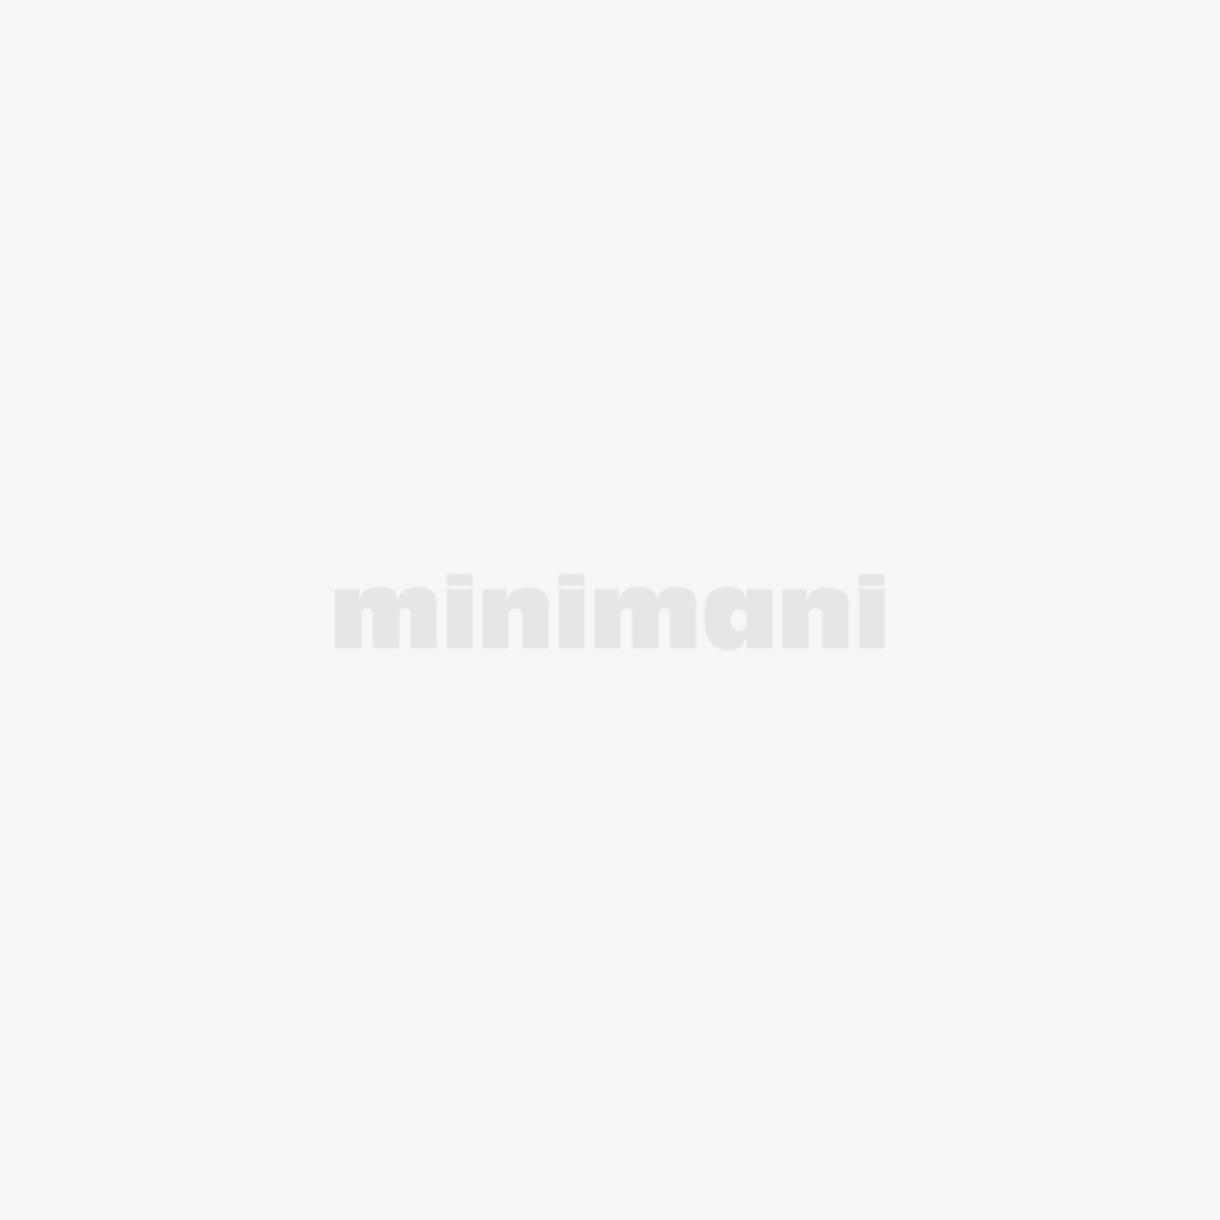 Finlayson kylpypyyhe 70x150cm, Reiluraita harmaa/musta